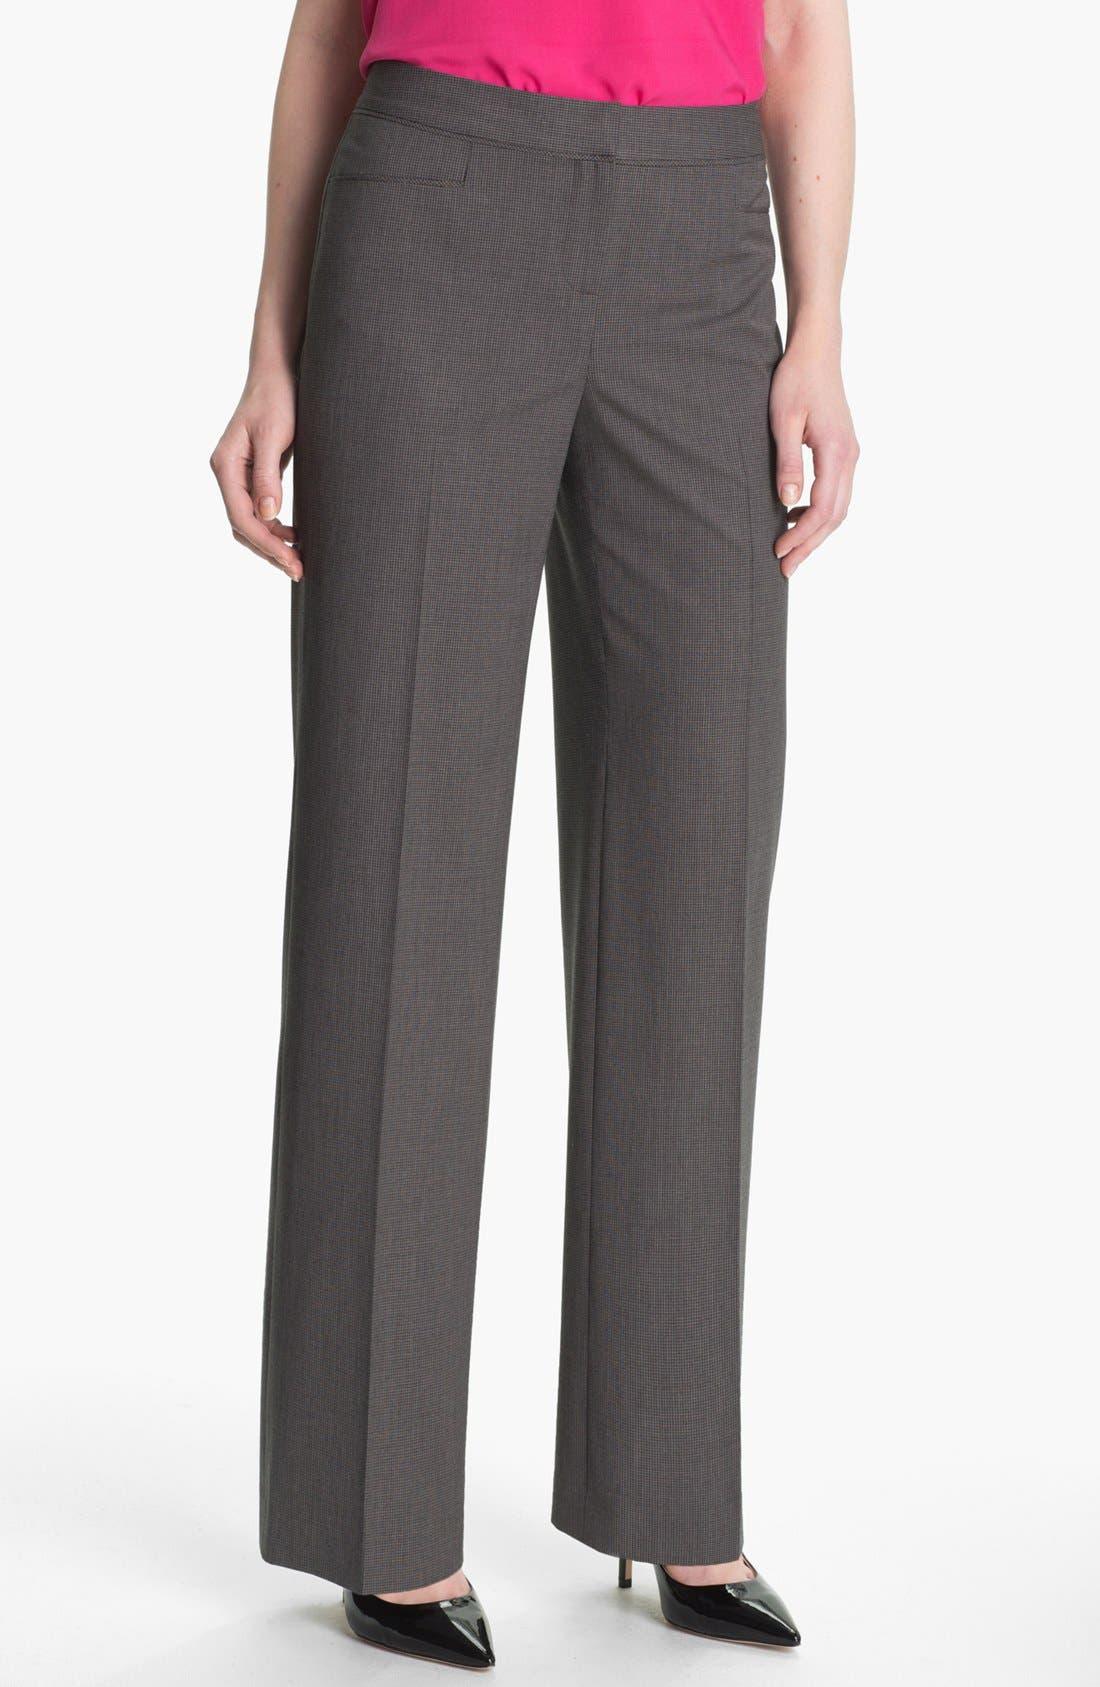 Alternate Image 1 Selected - Halogen® 'Taylor' Mini Check Curvy Fit Pants (Petite)